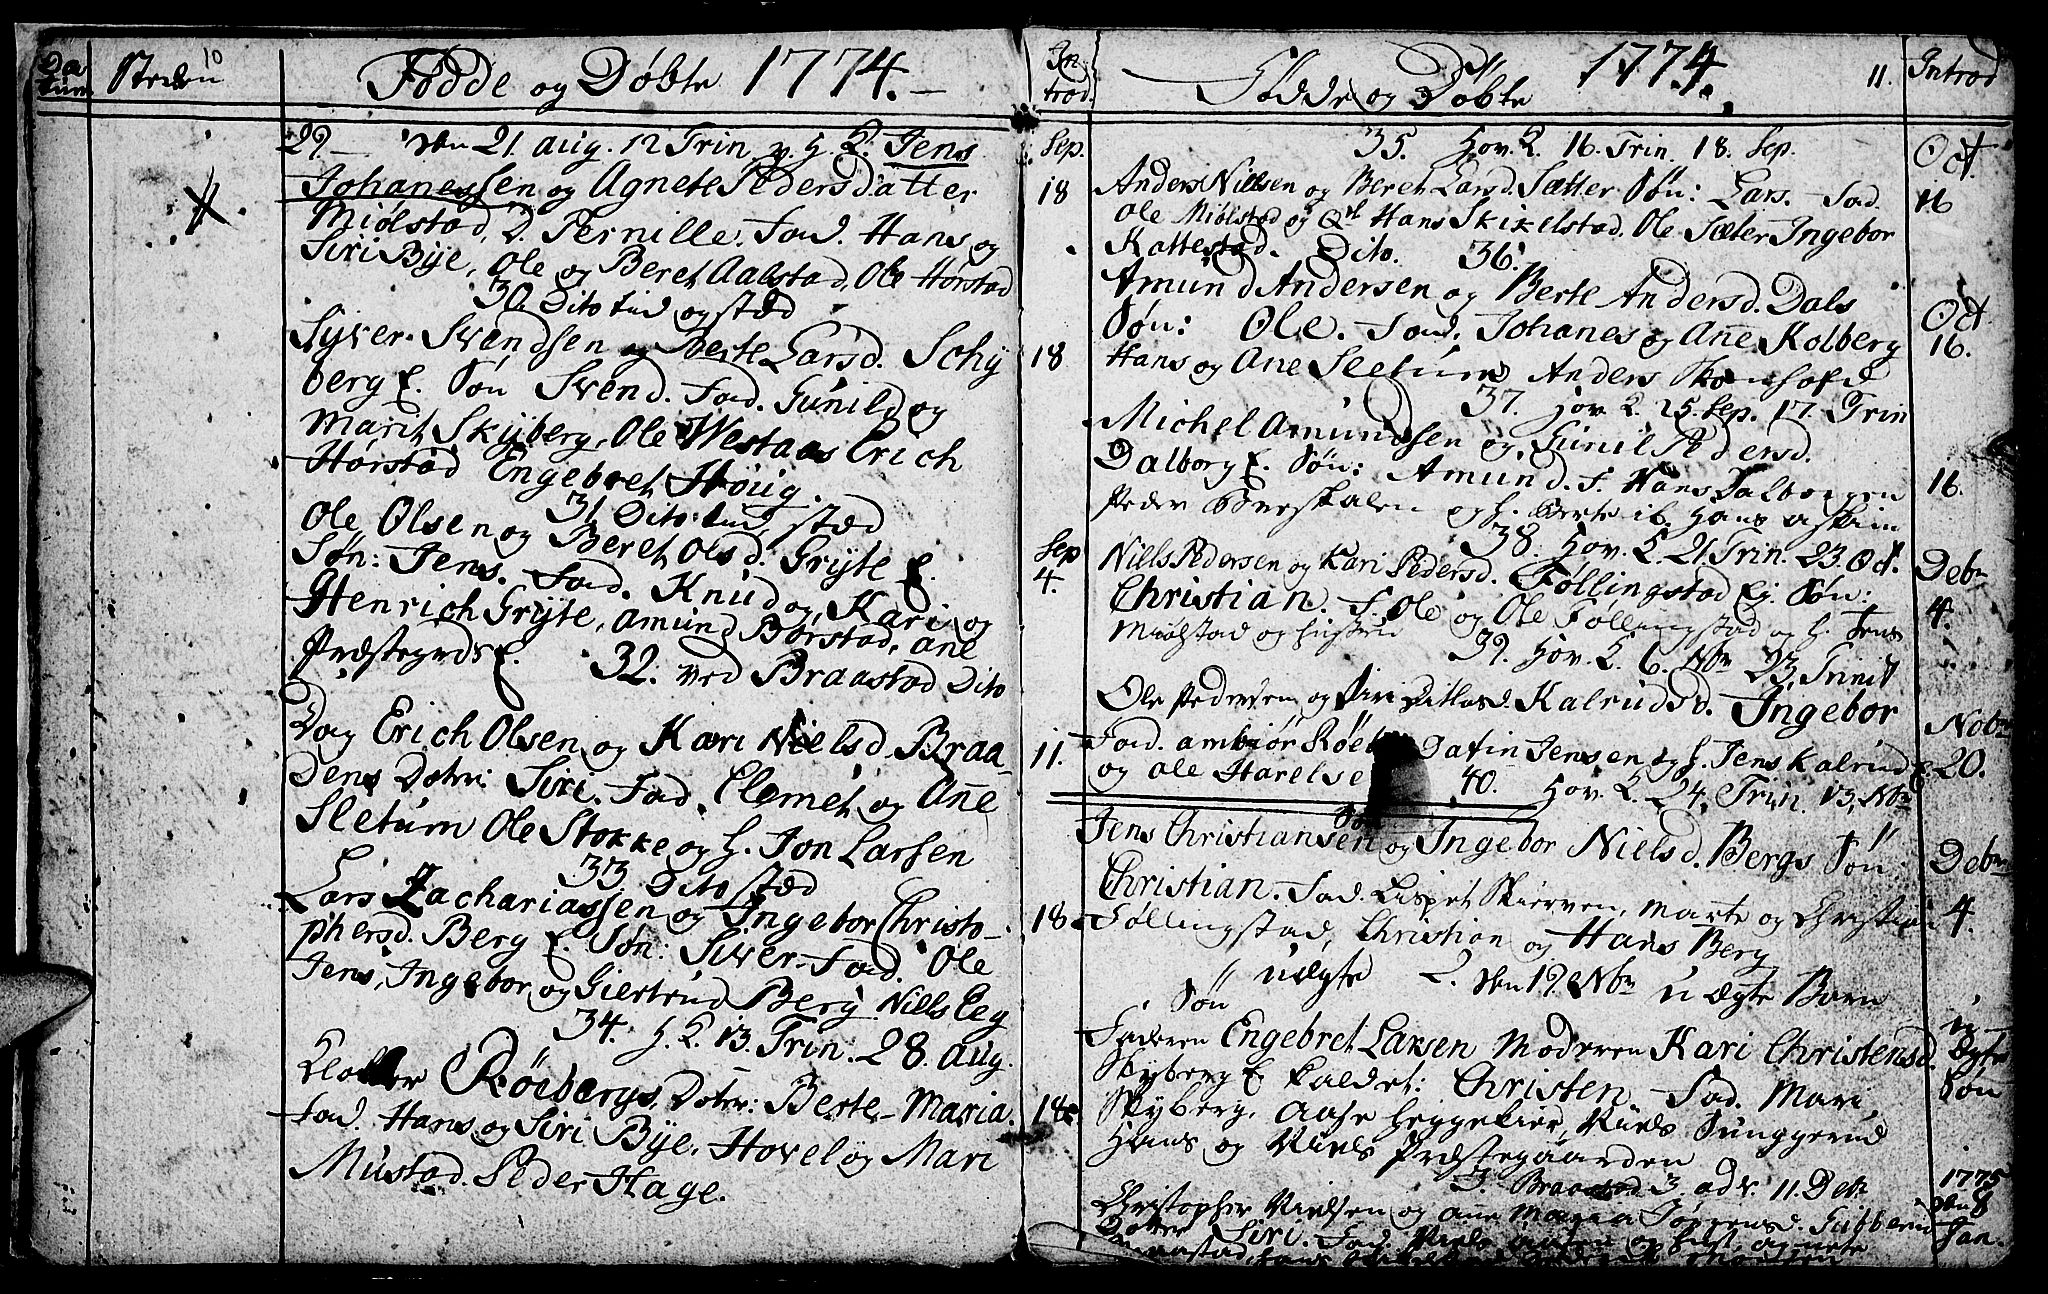 SAH, Vardal prestekontor, H/Ha/Hab/L0001: Klokkerbok nr. 1, 1771-1790, s. 10-11